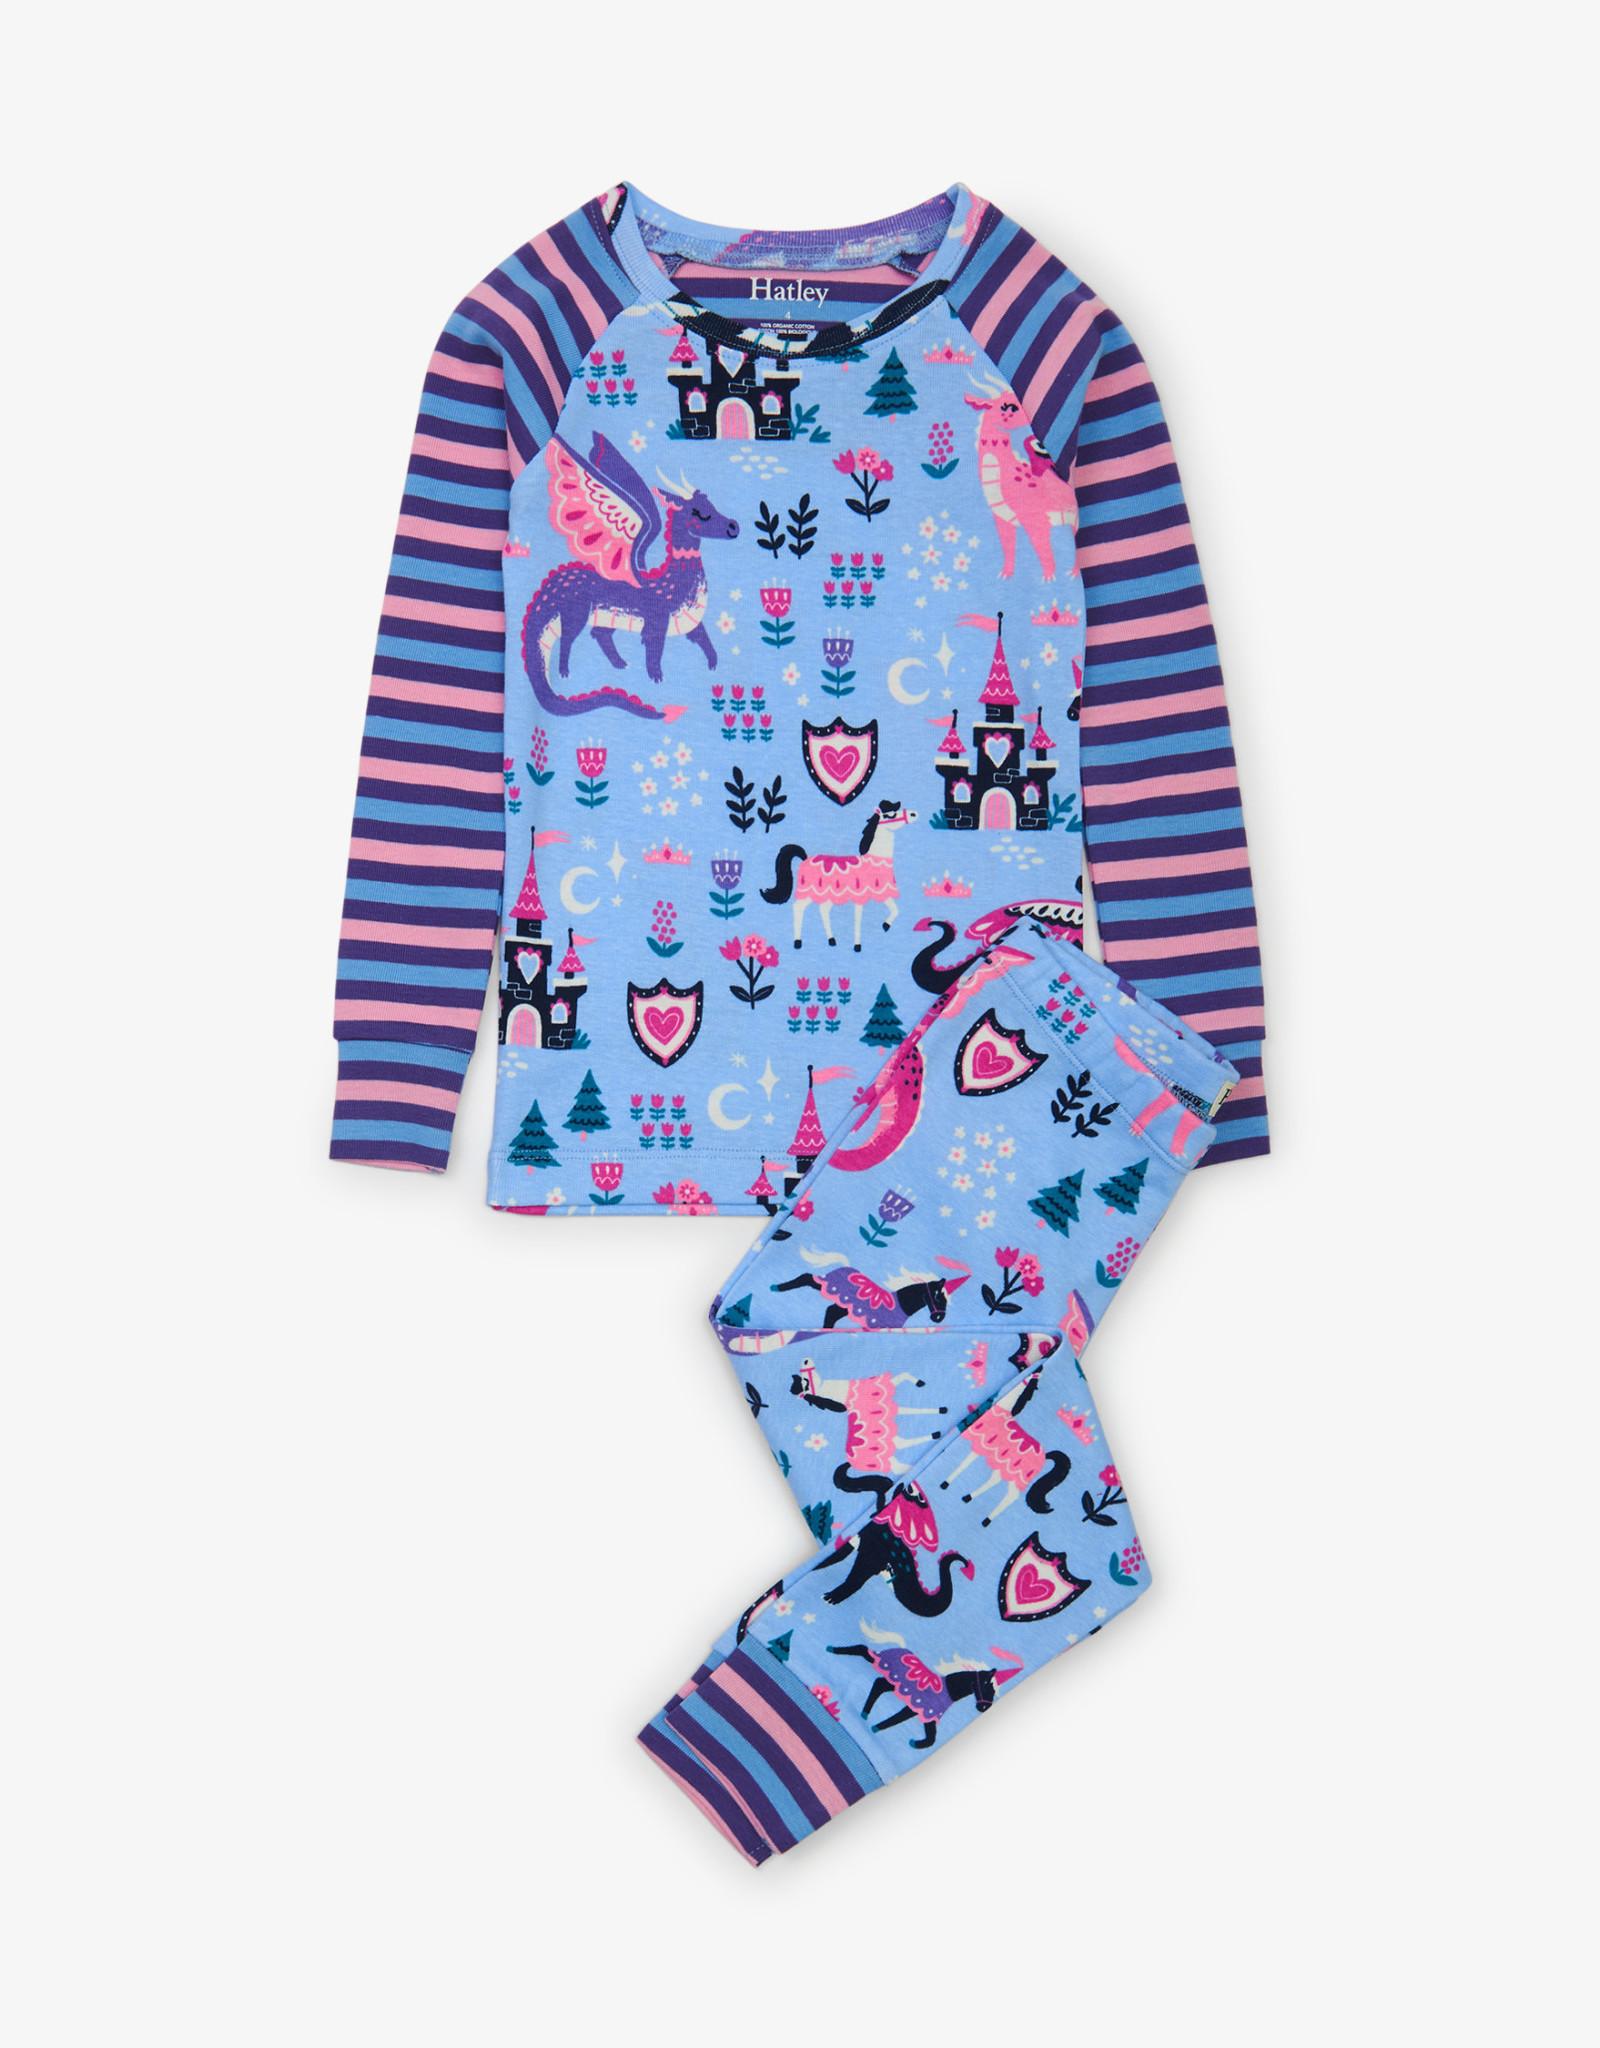 Hatley Enchanted Forest Organic Cotton Raglan Pajama Set